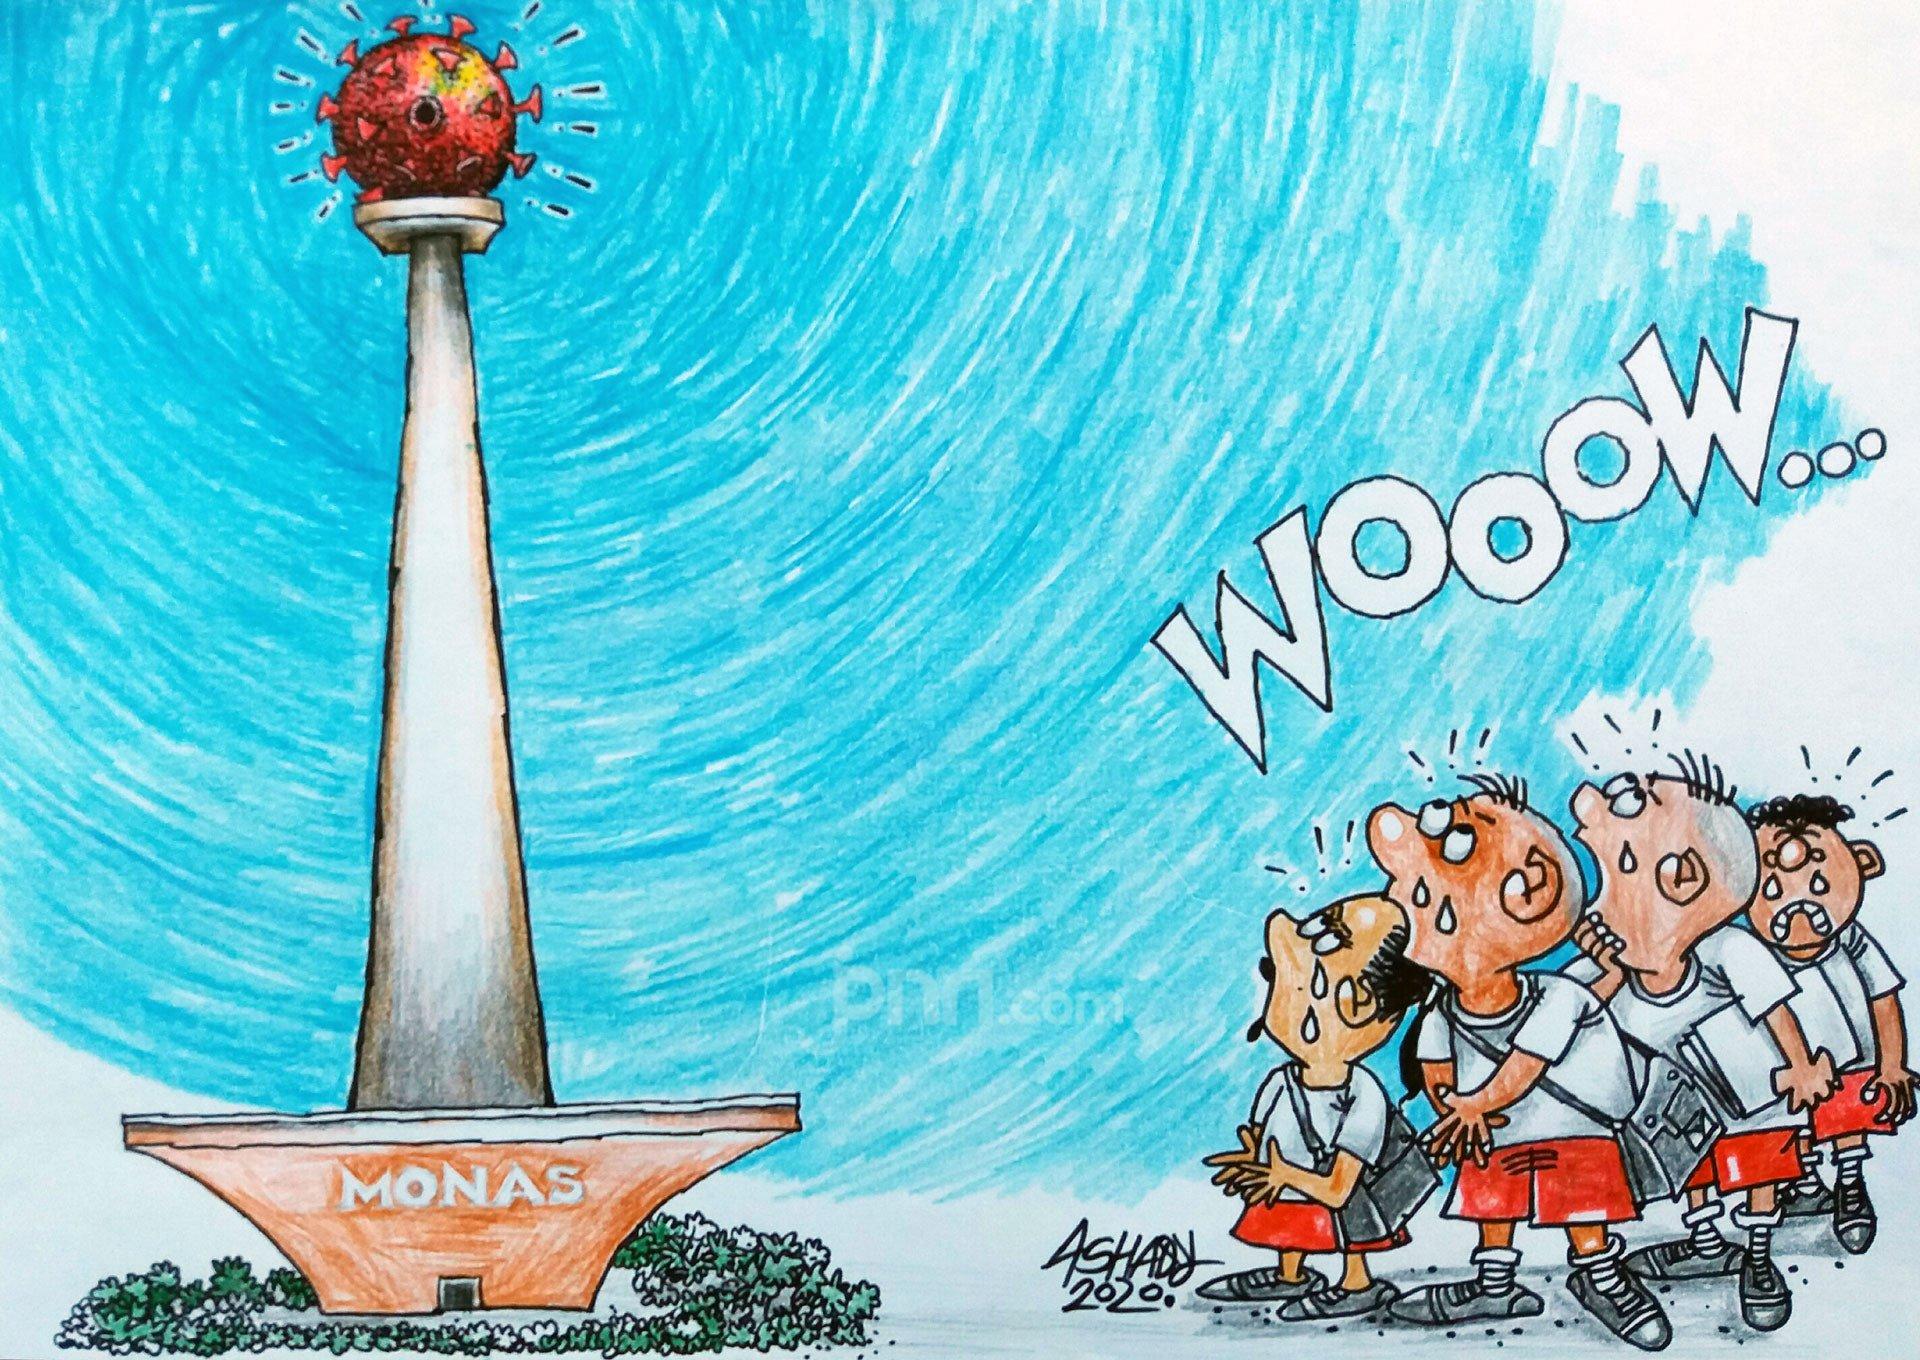 Jakarta Zona Merah. Karikatur oleh Ashady - JPNN.com